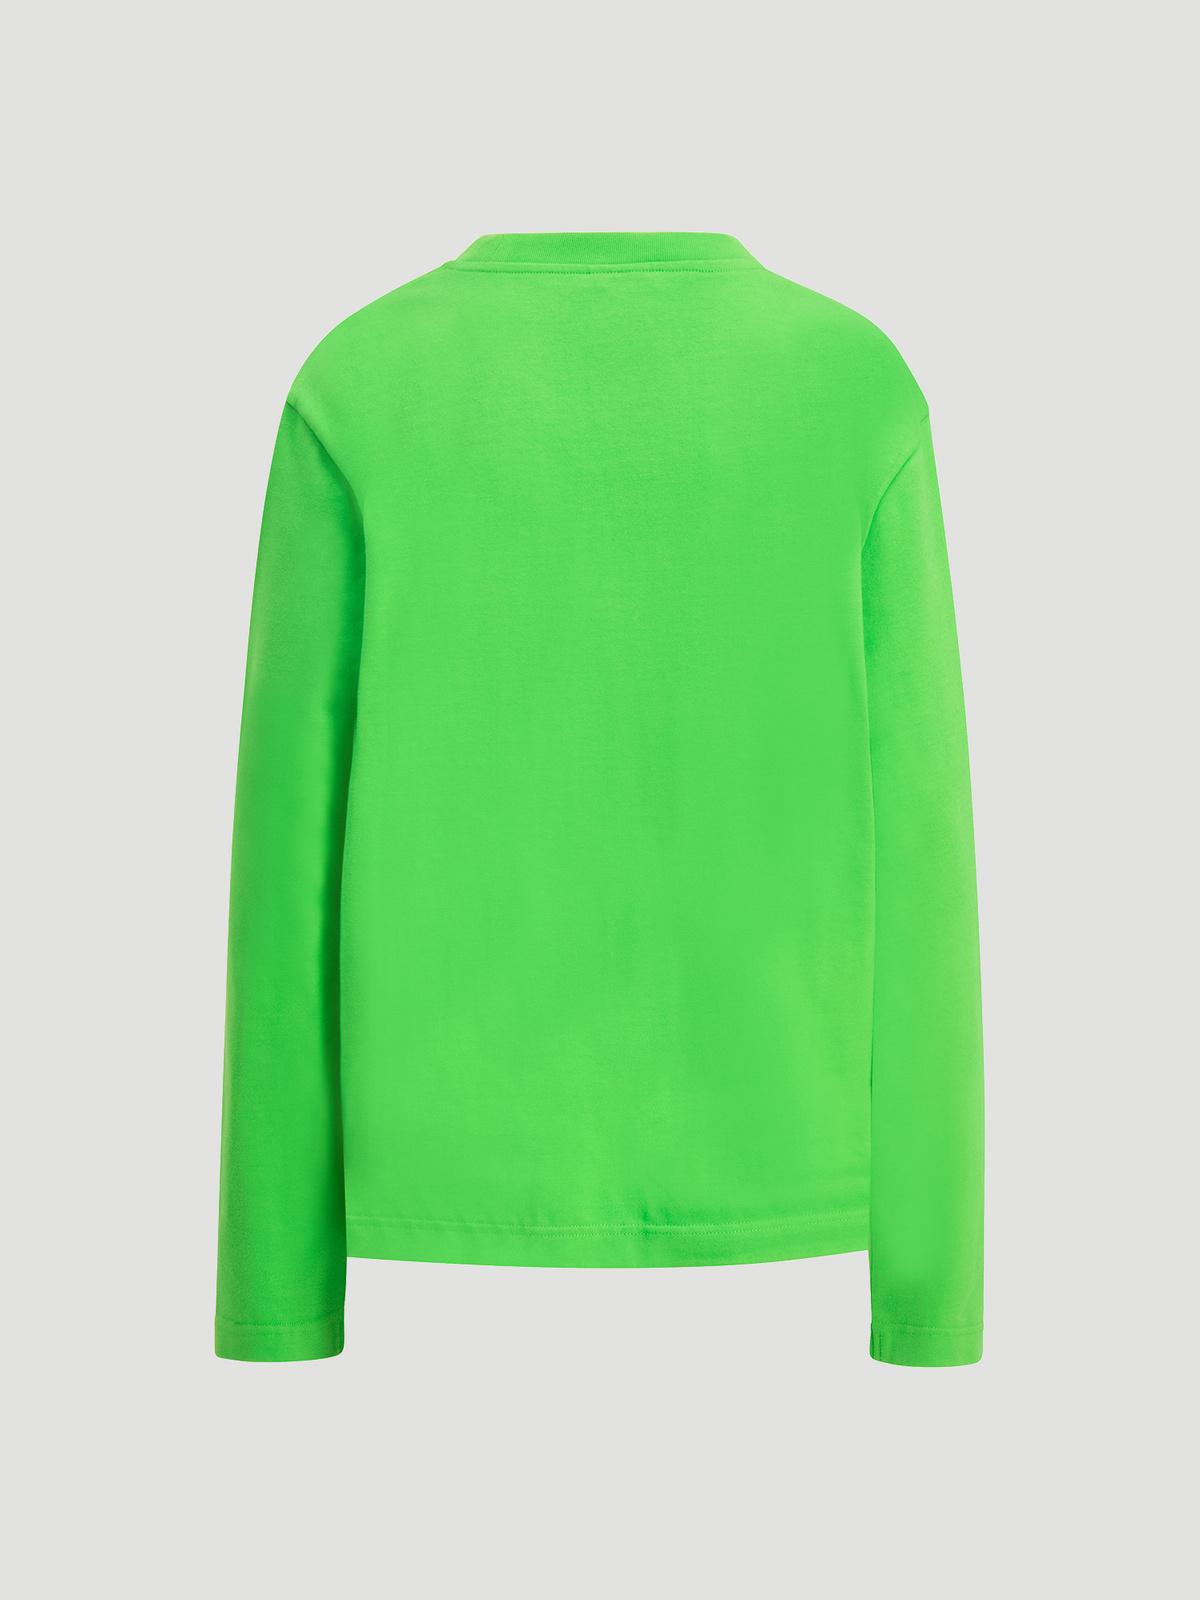 Hanger Longsleeve Green 1